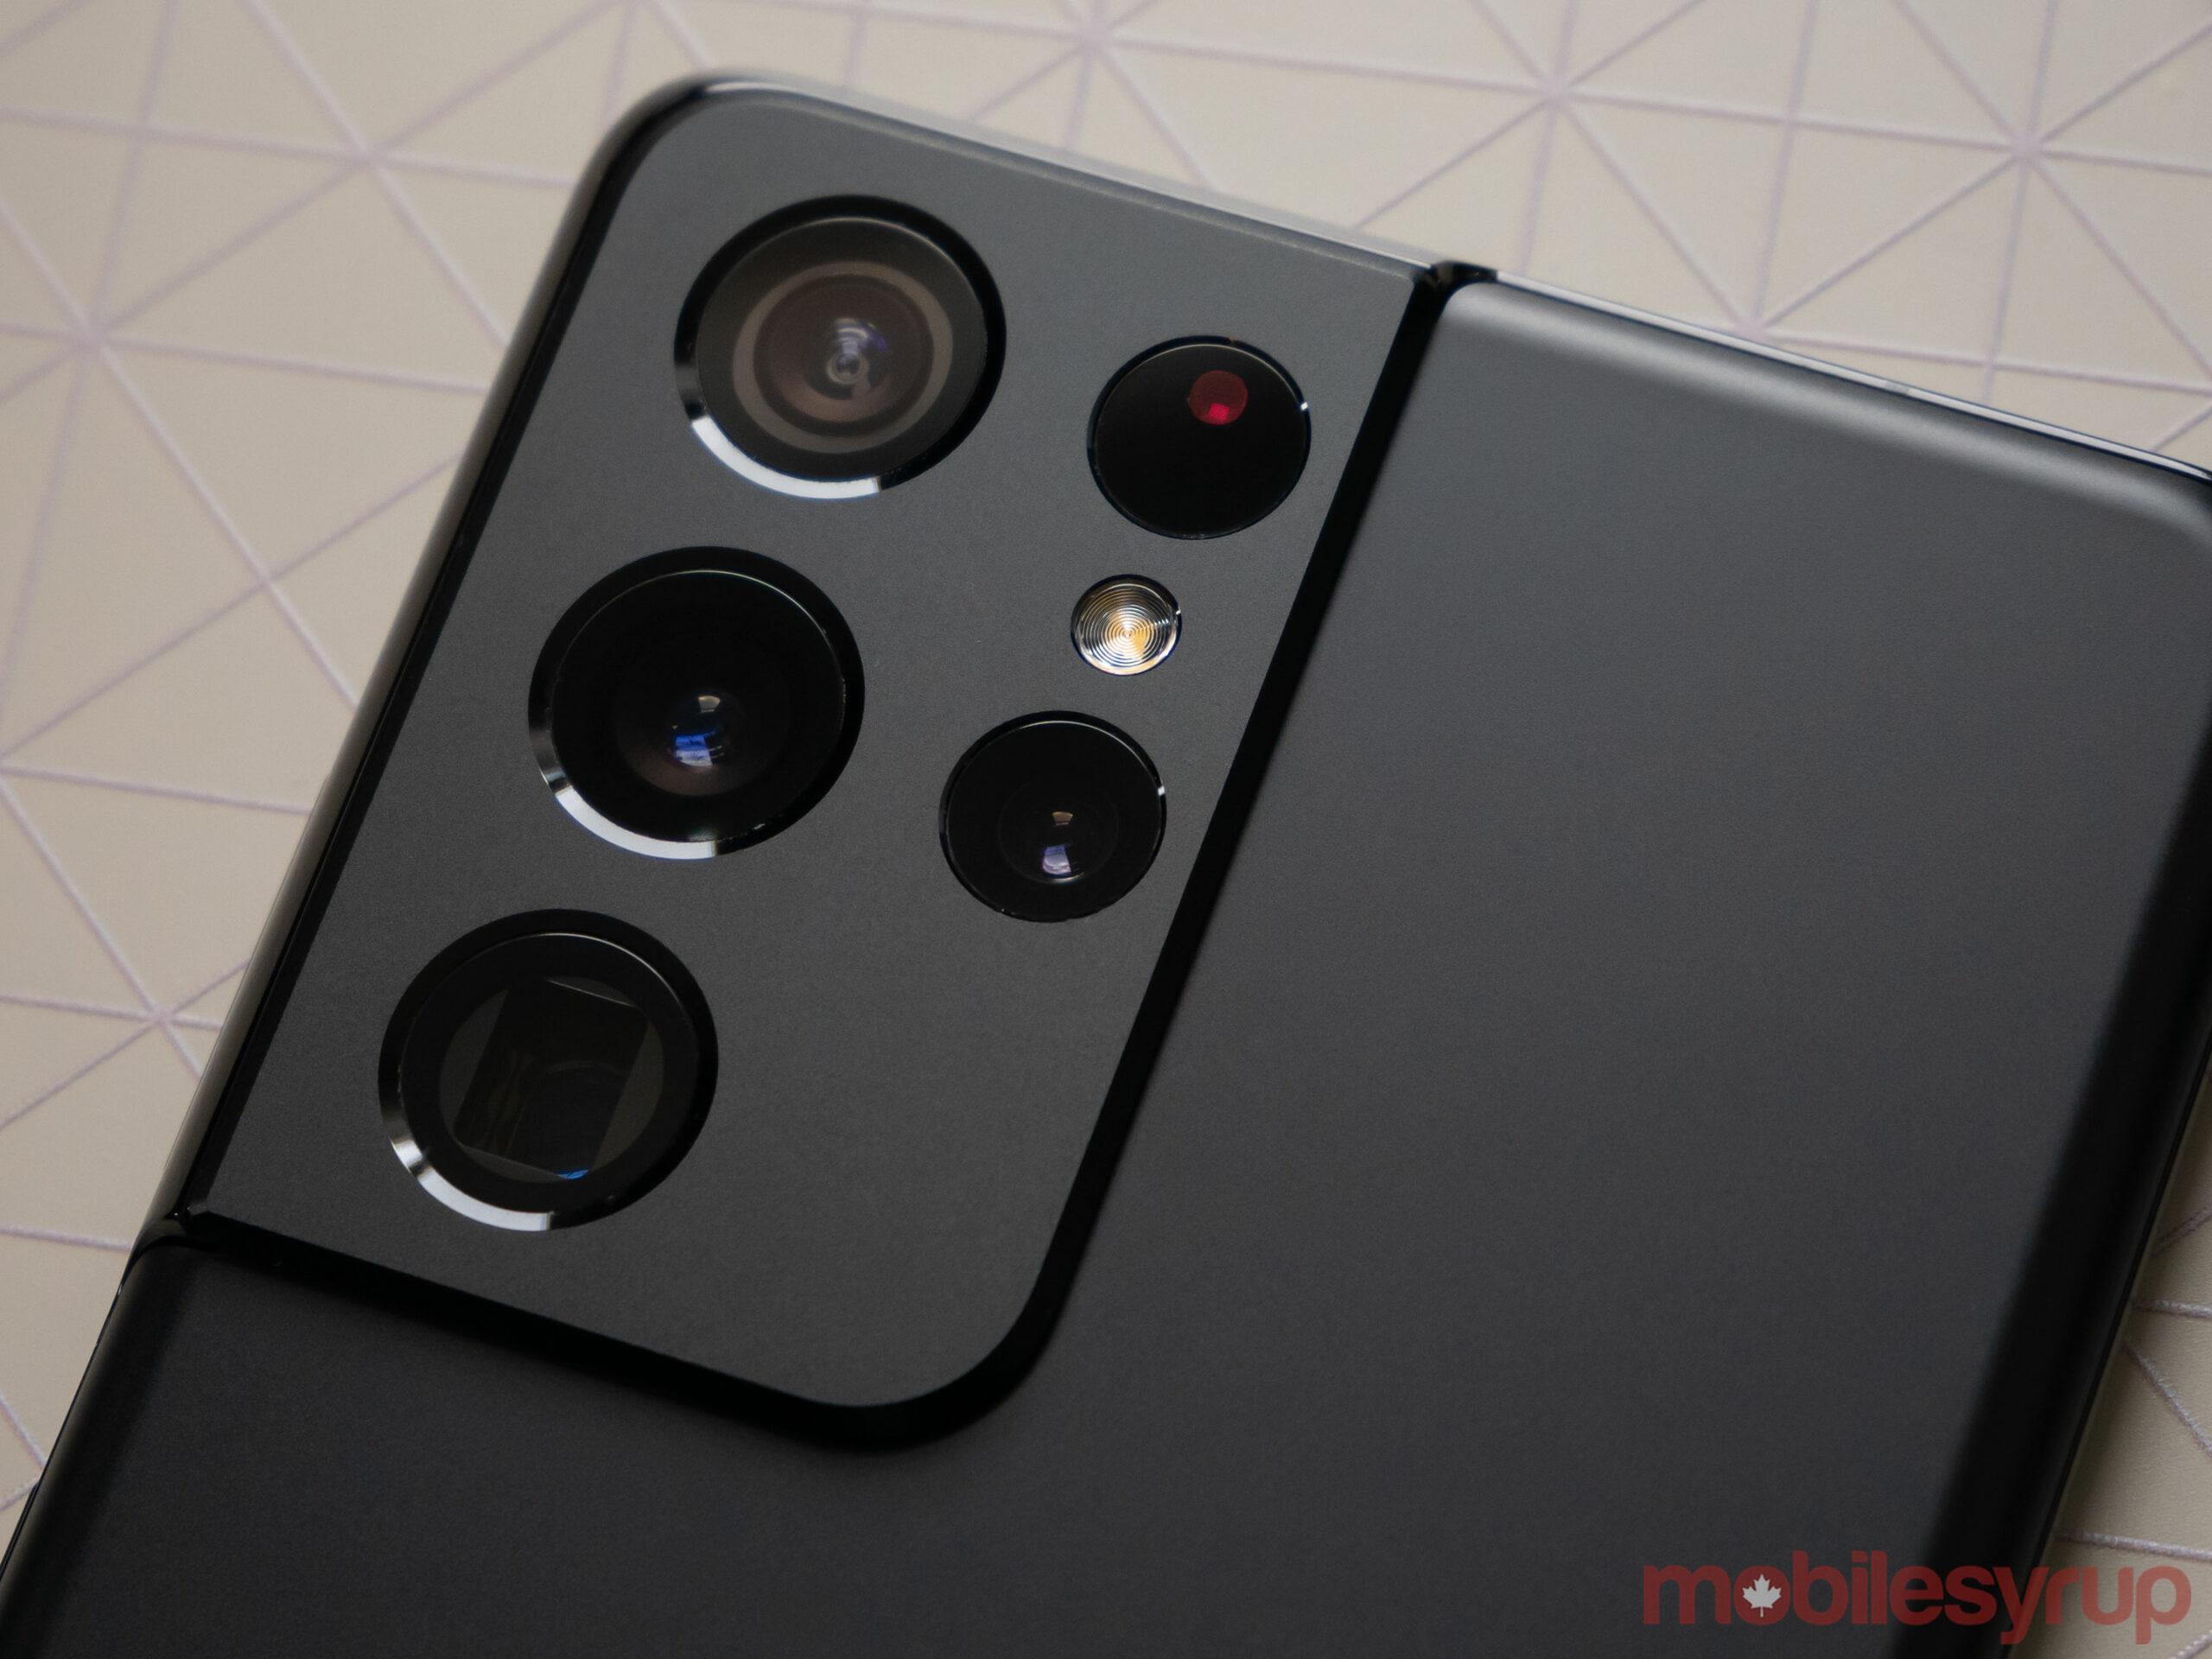 Galaxy S21 Ultra camera bump